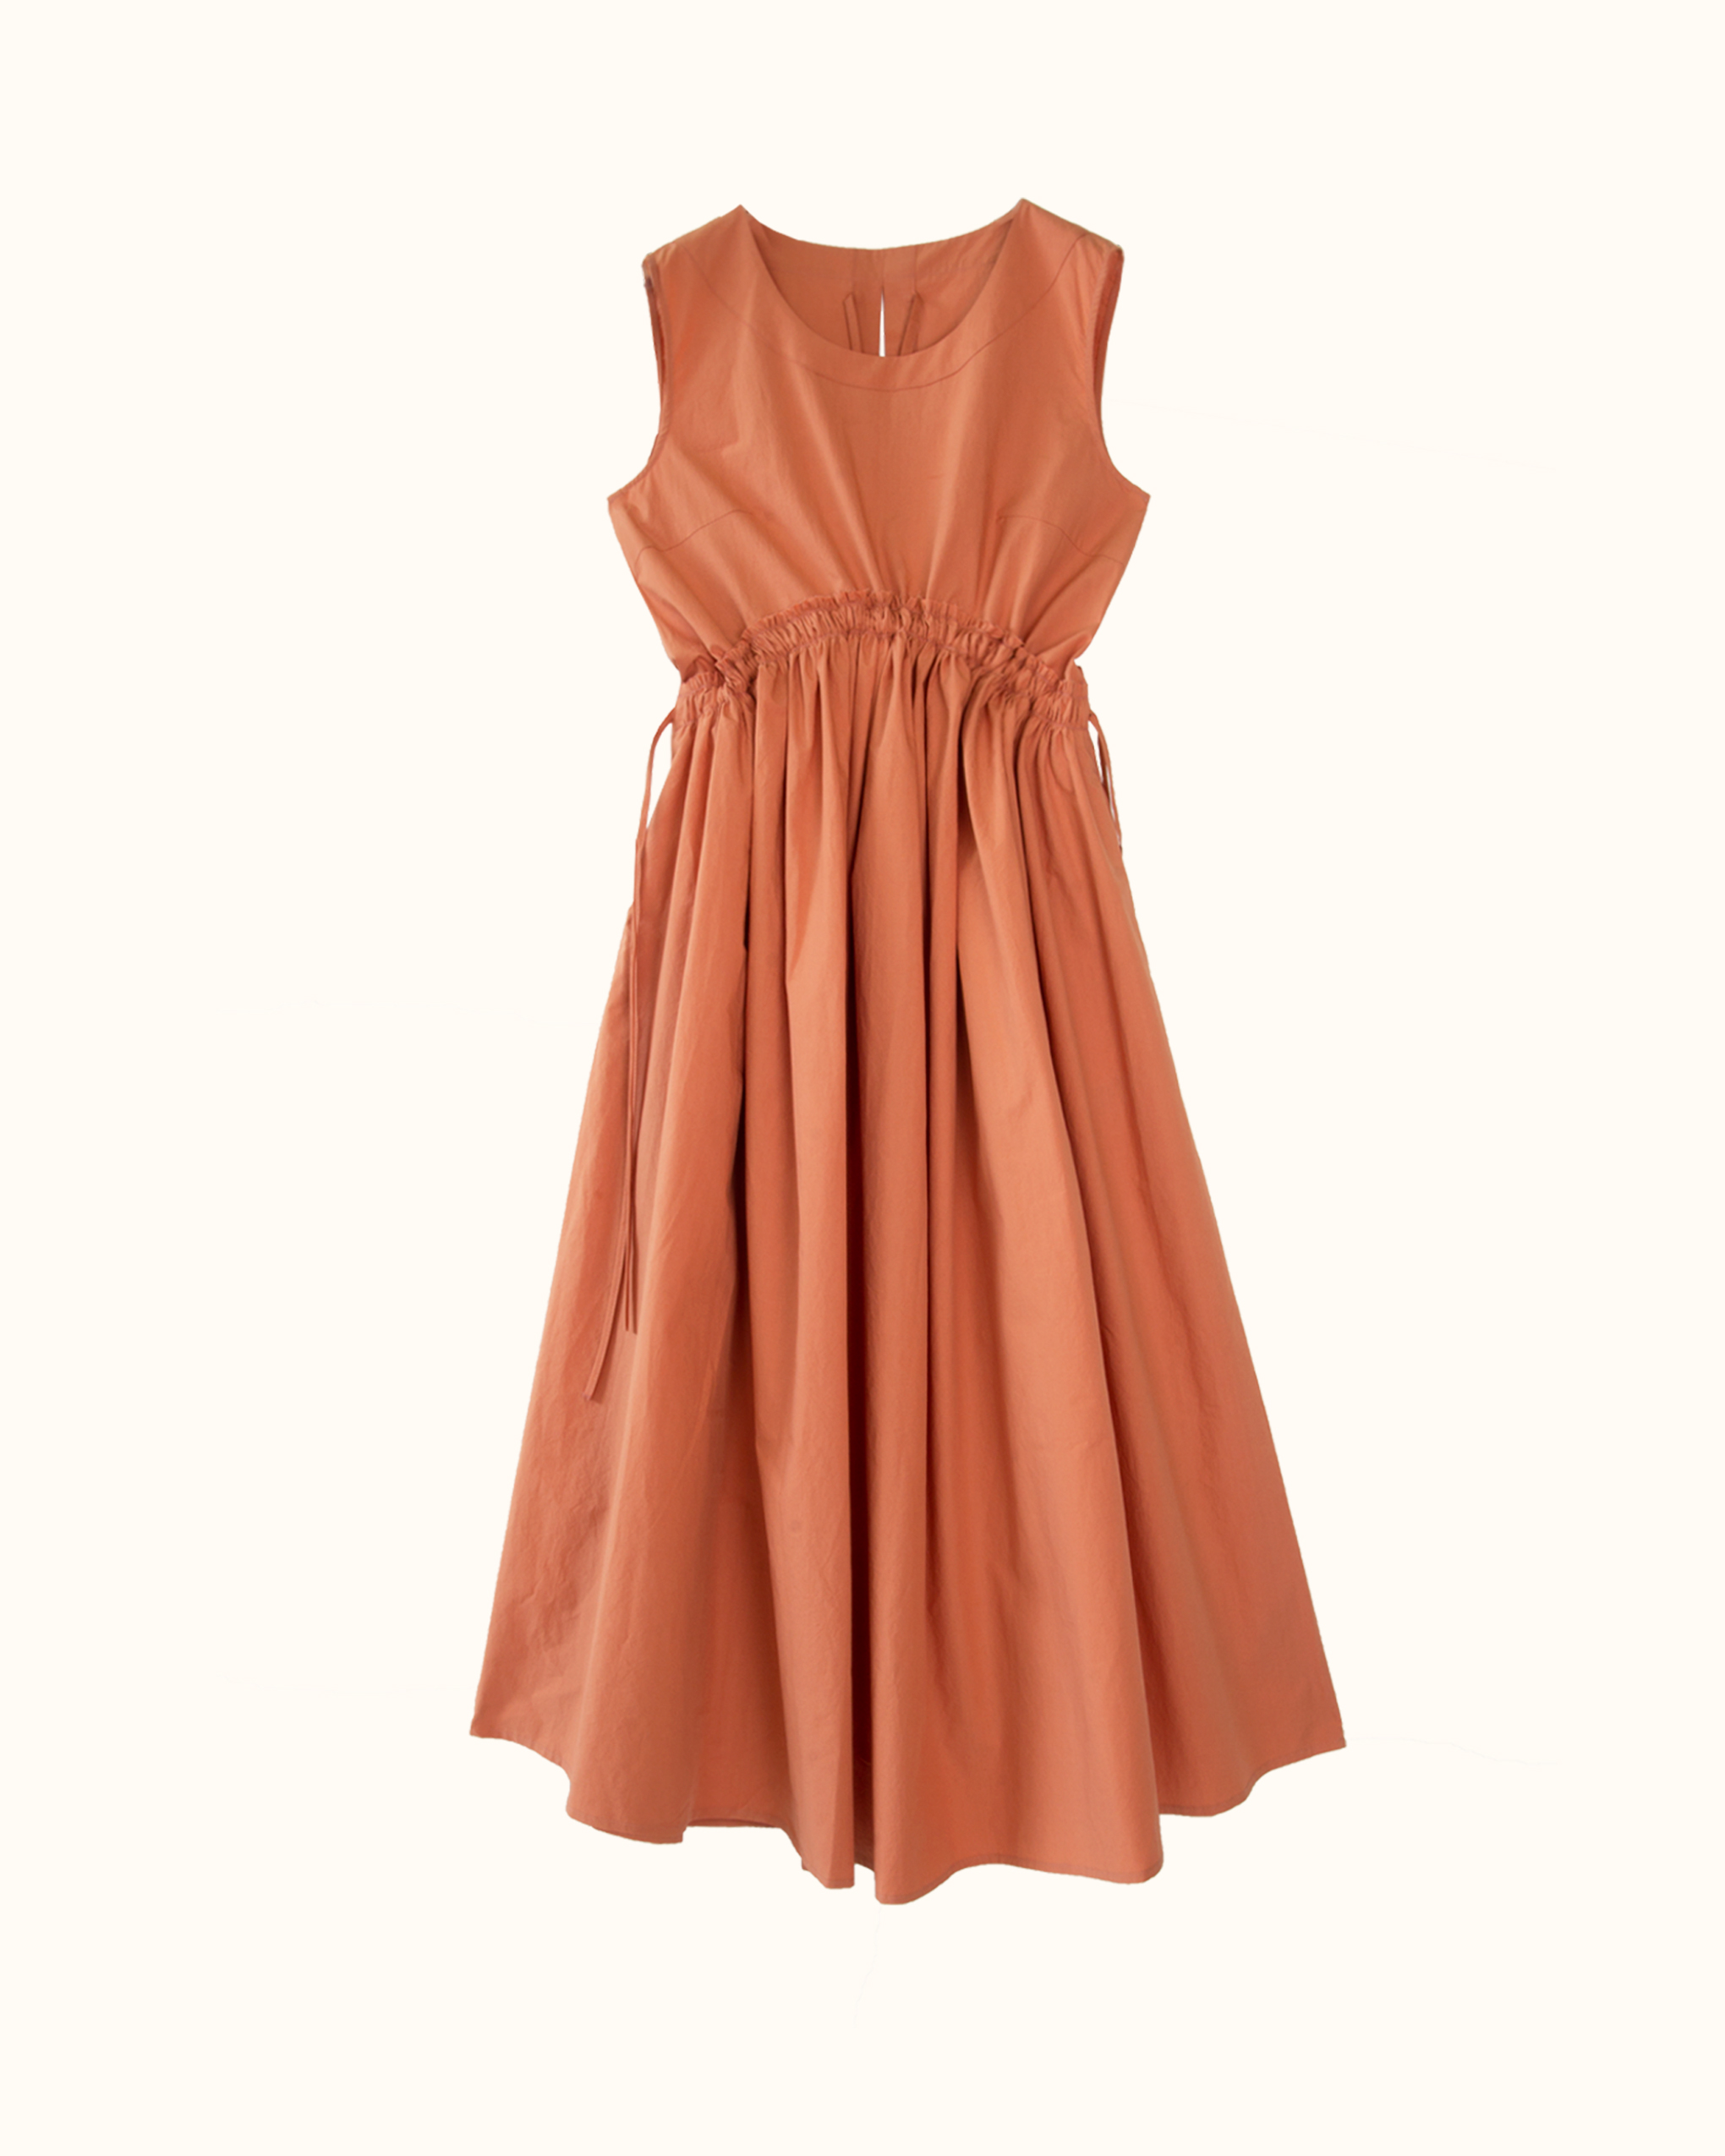 An orange curved shirred waist side tie dress.